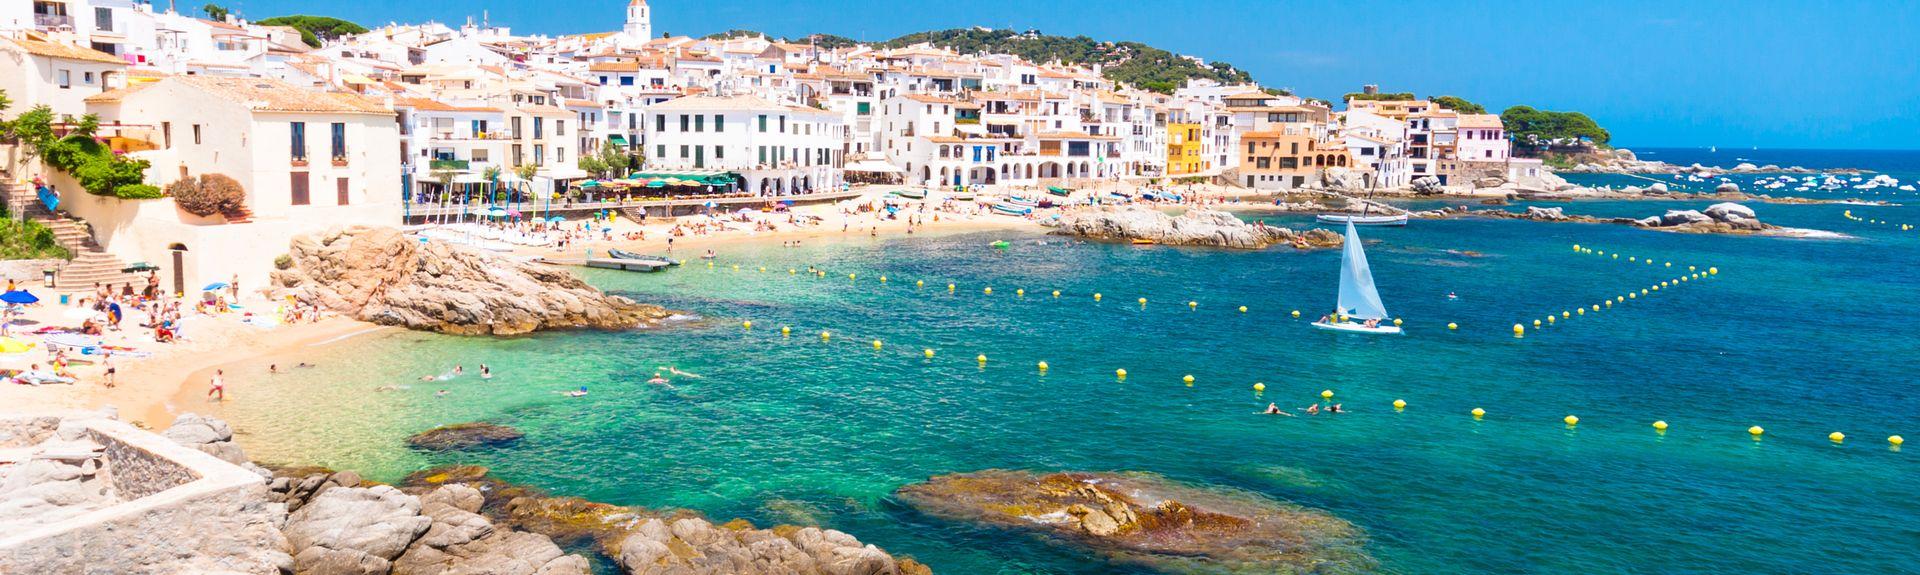 Calella de Palafrugell, Province of Girona, Spain